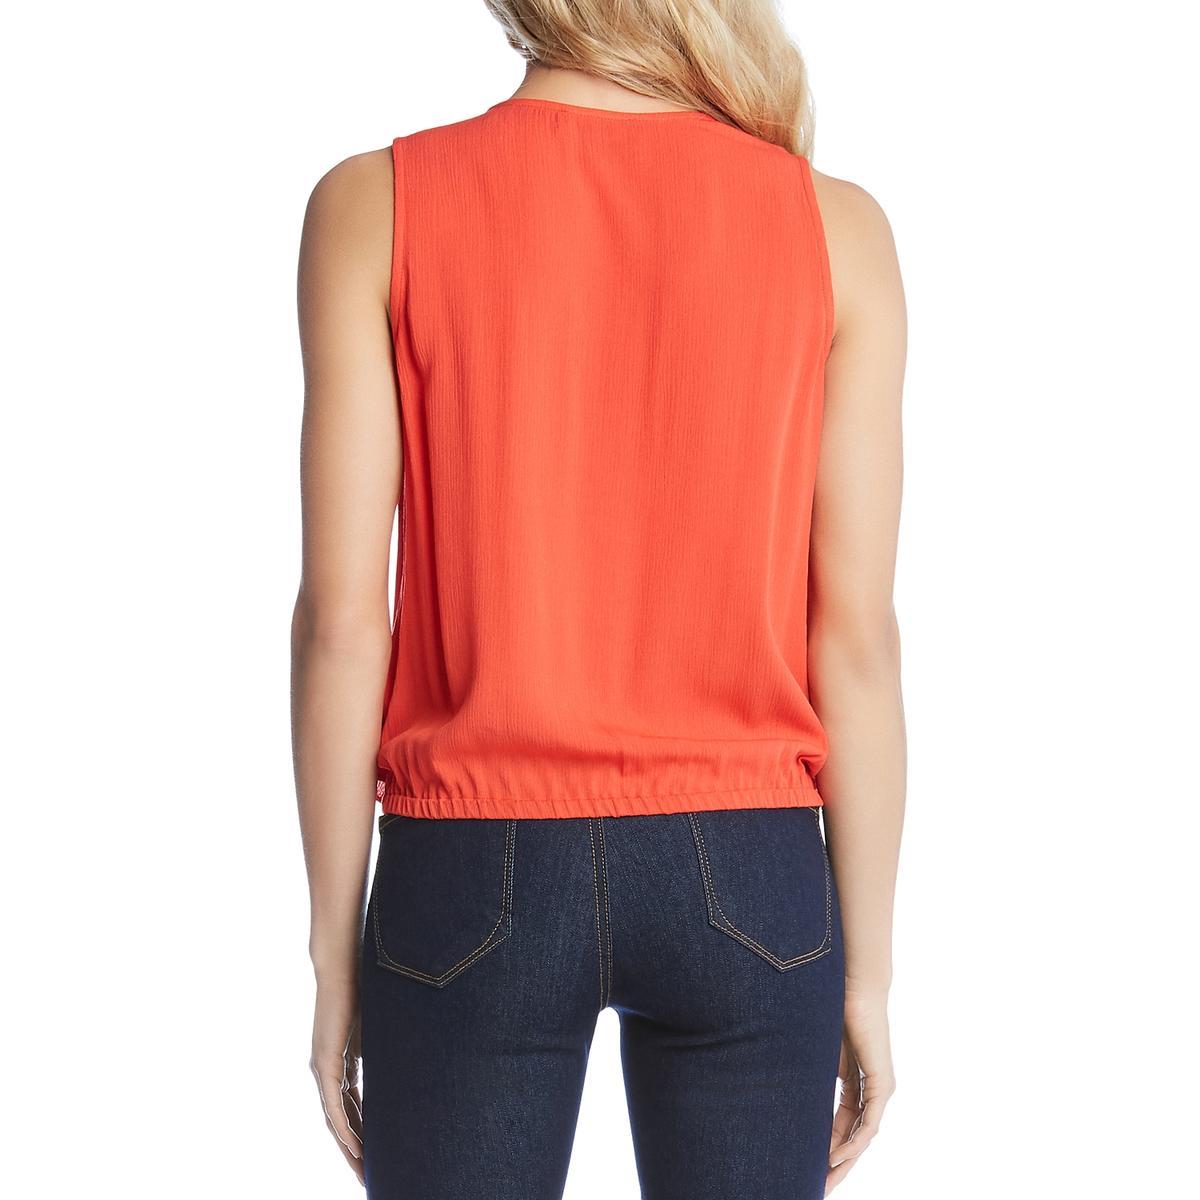 Karen Kane Womens Layered Tie-Front Sleeveless Top Shirt BHFO 7178